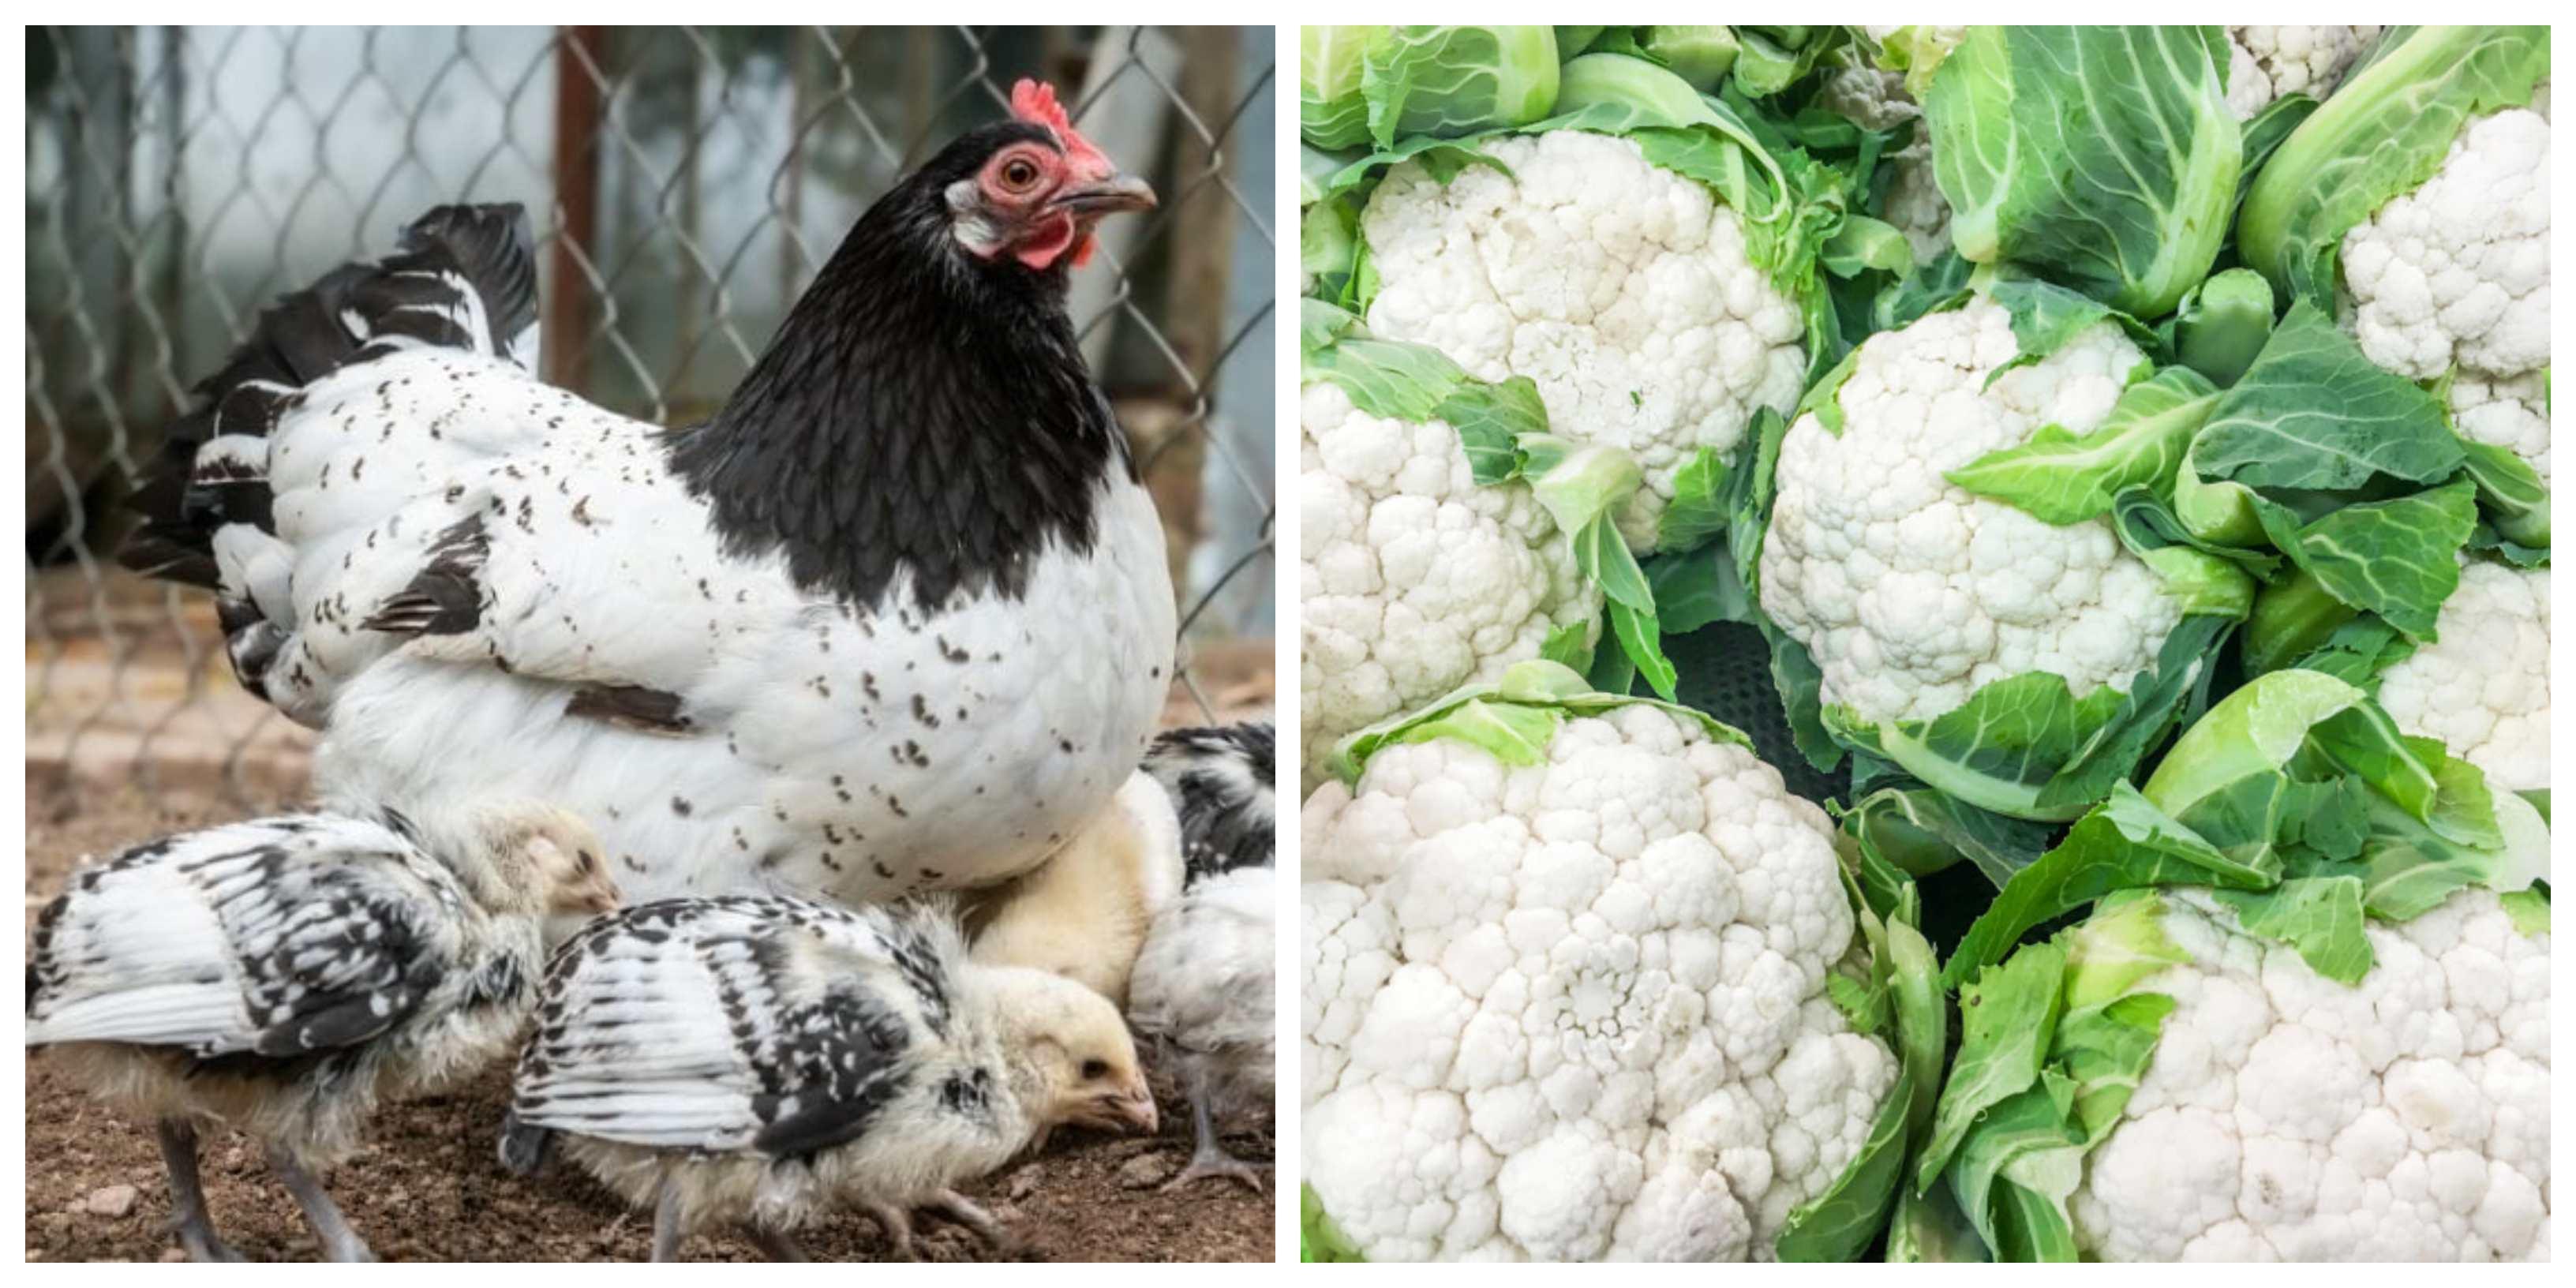 chickens and cauliflower